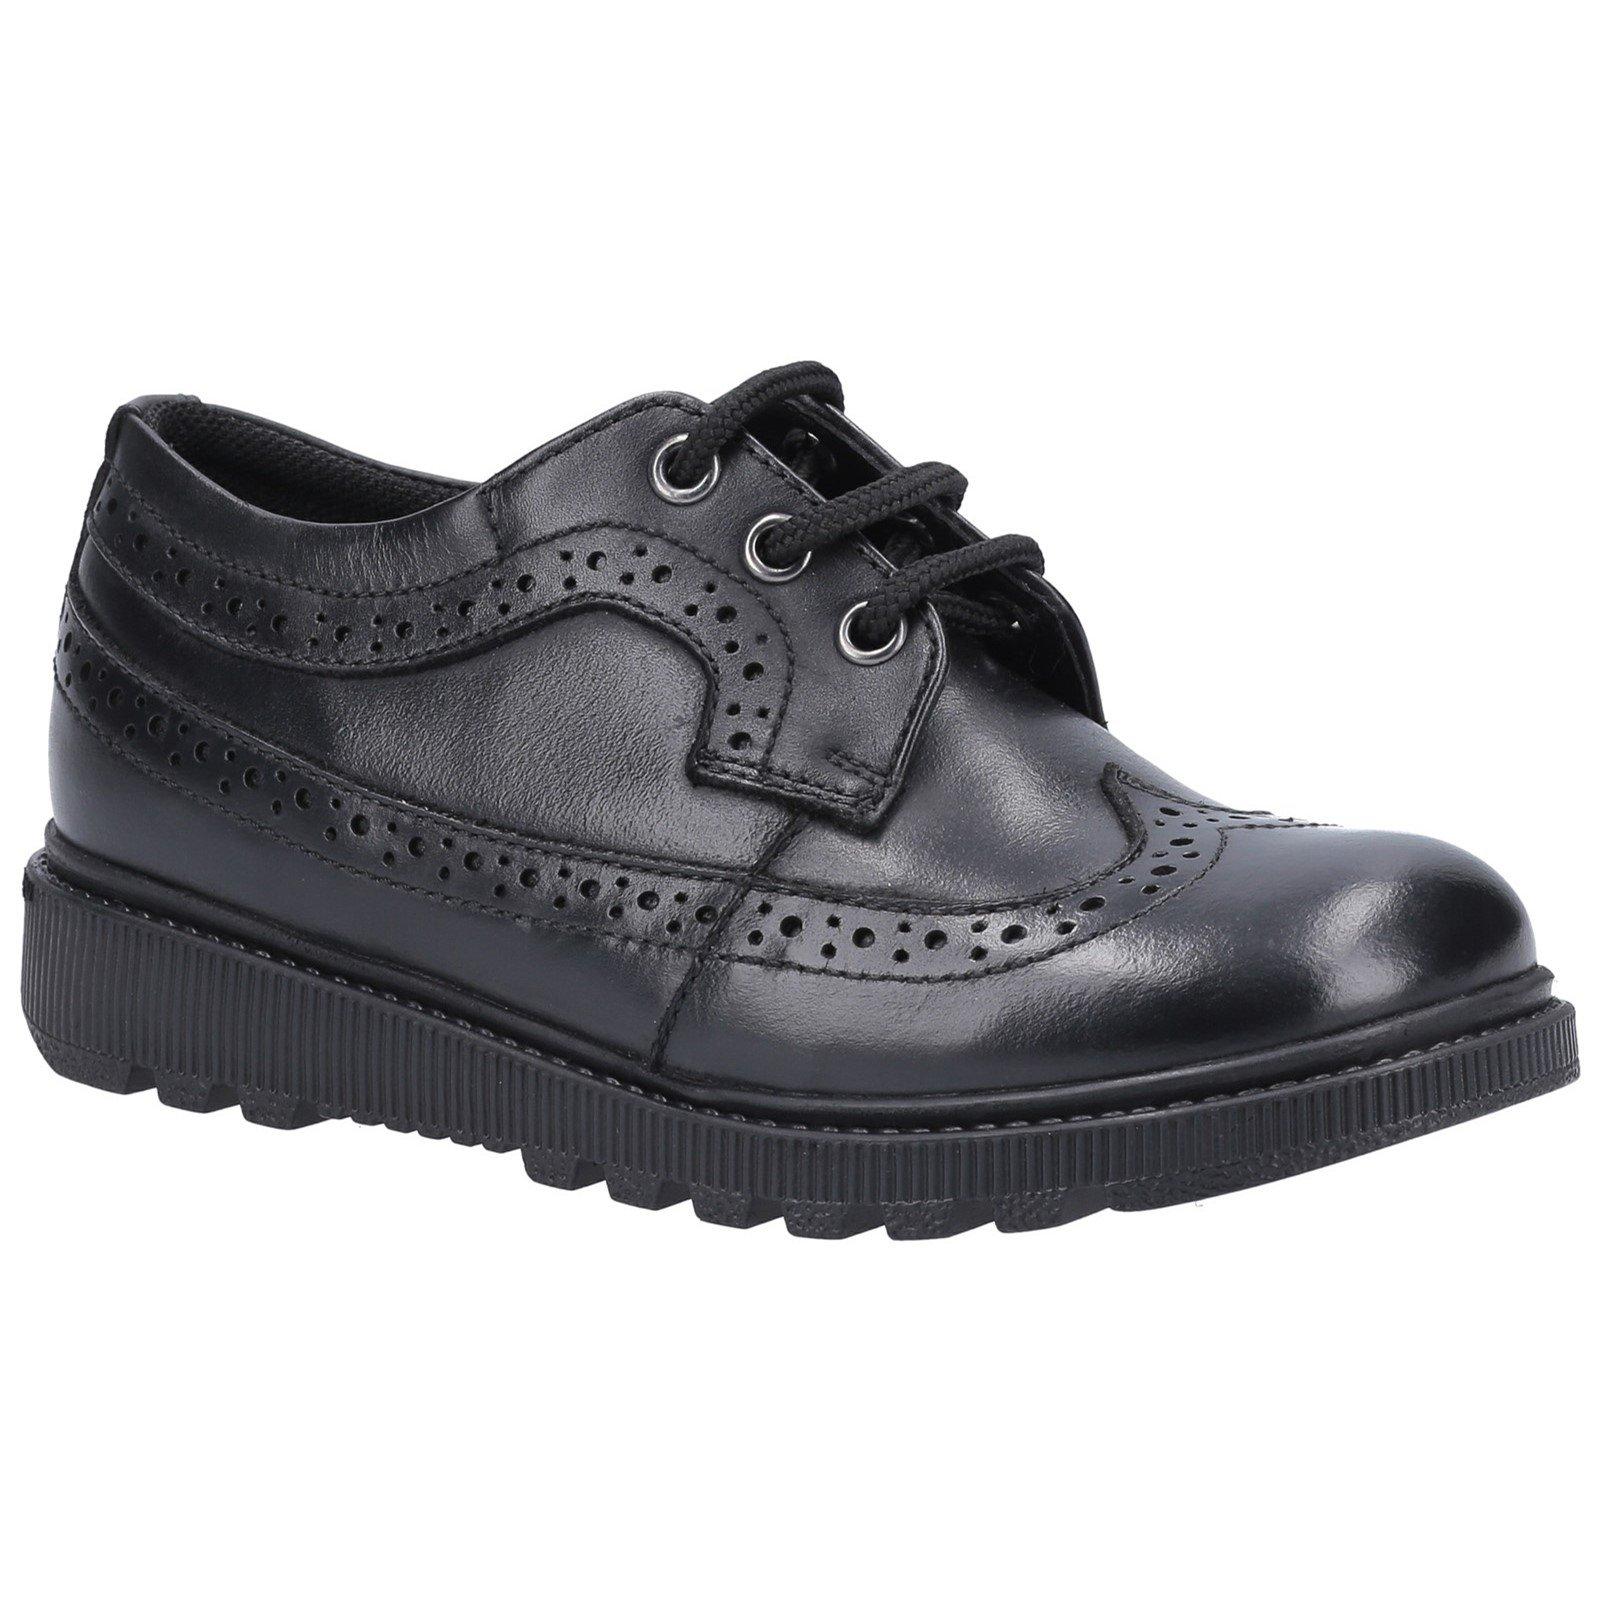 Hush Puppies Kid's Felicity Junior School Oxford Shoe Black 30849 - Black 12